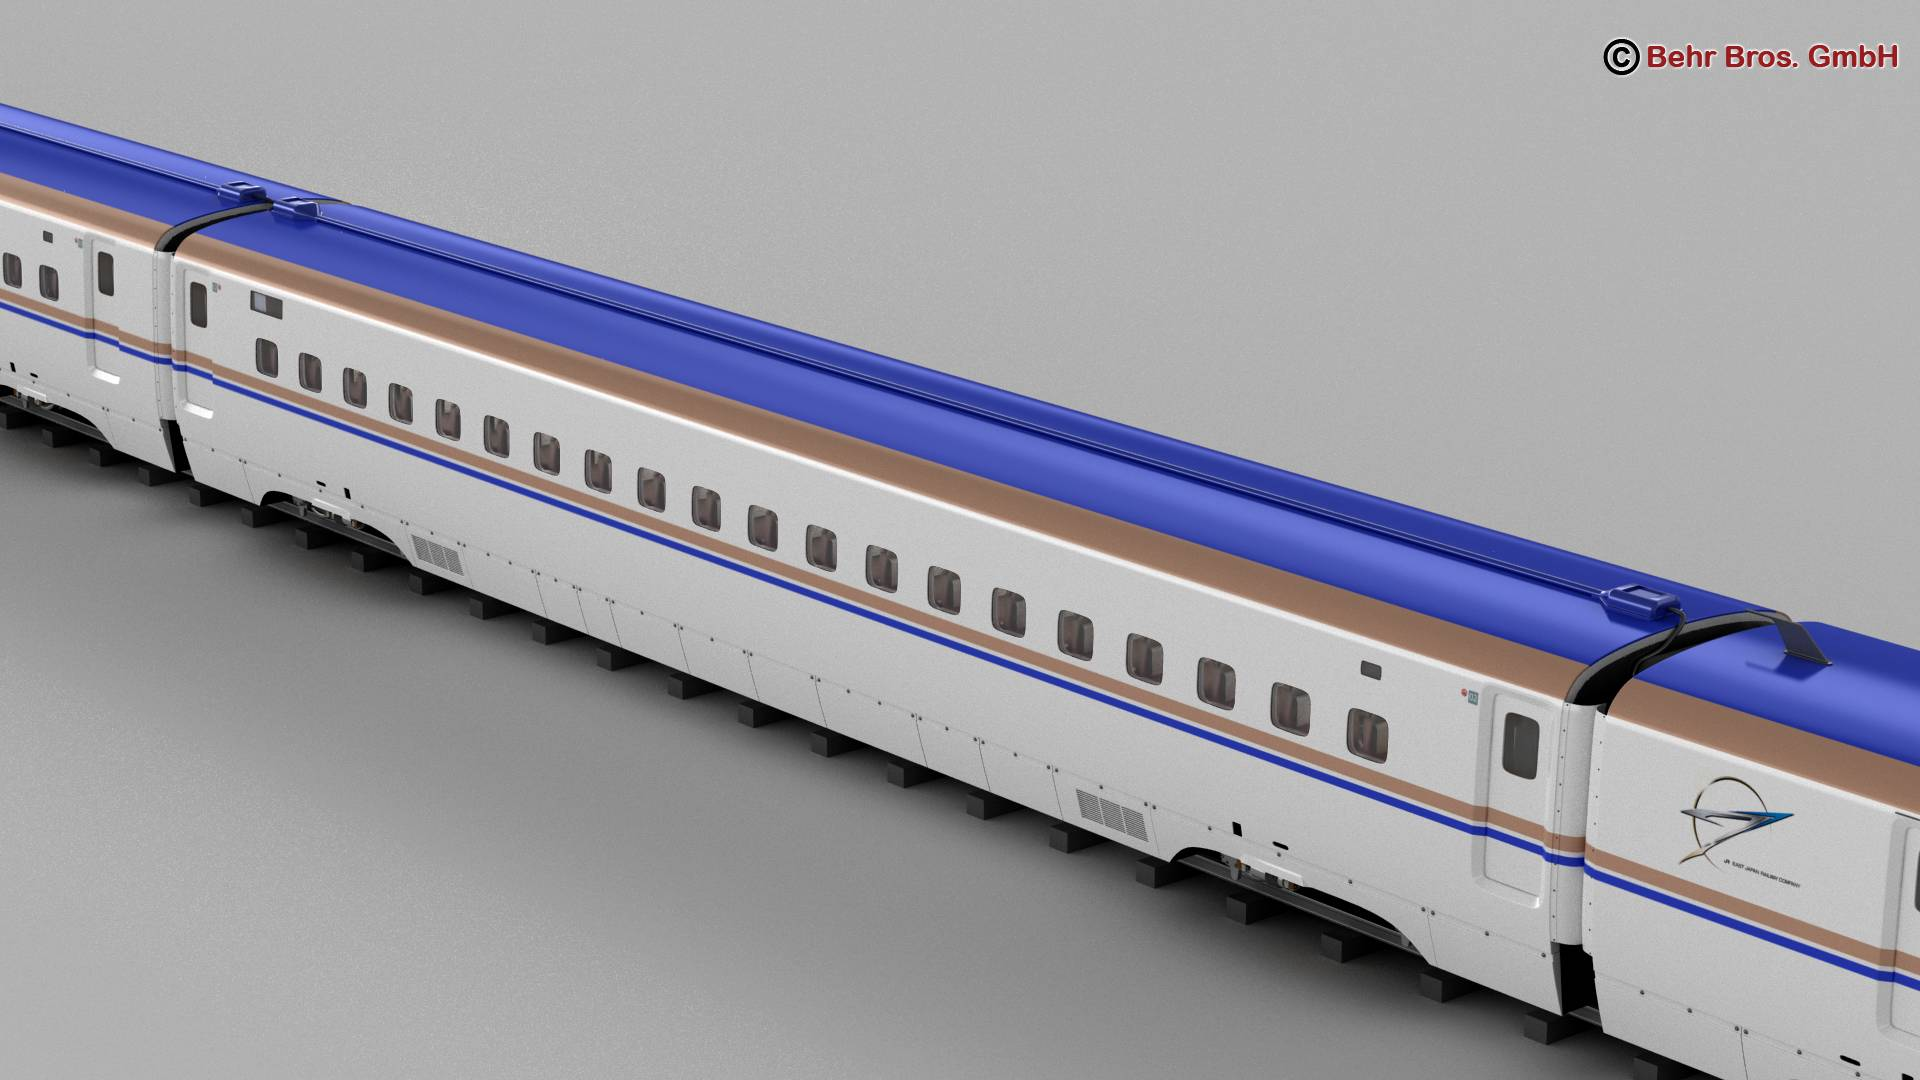 shinkansen e7 3d model 3ds max fbx c4d lwo ma mb obj 265651